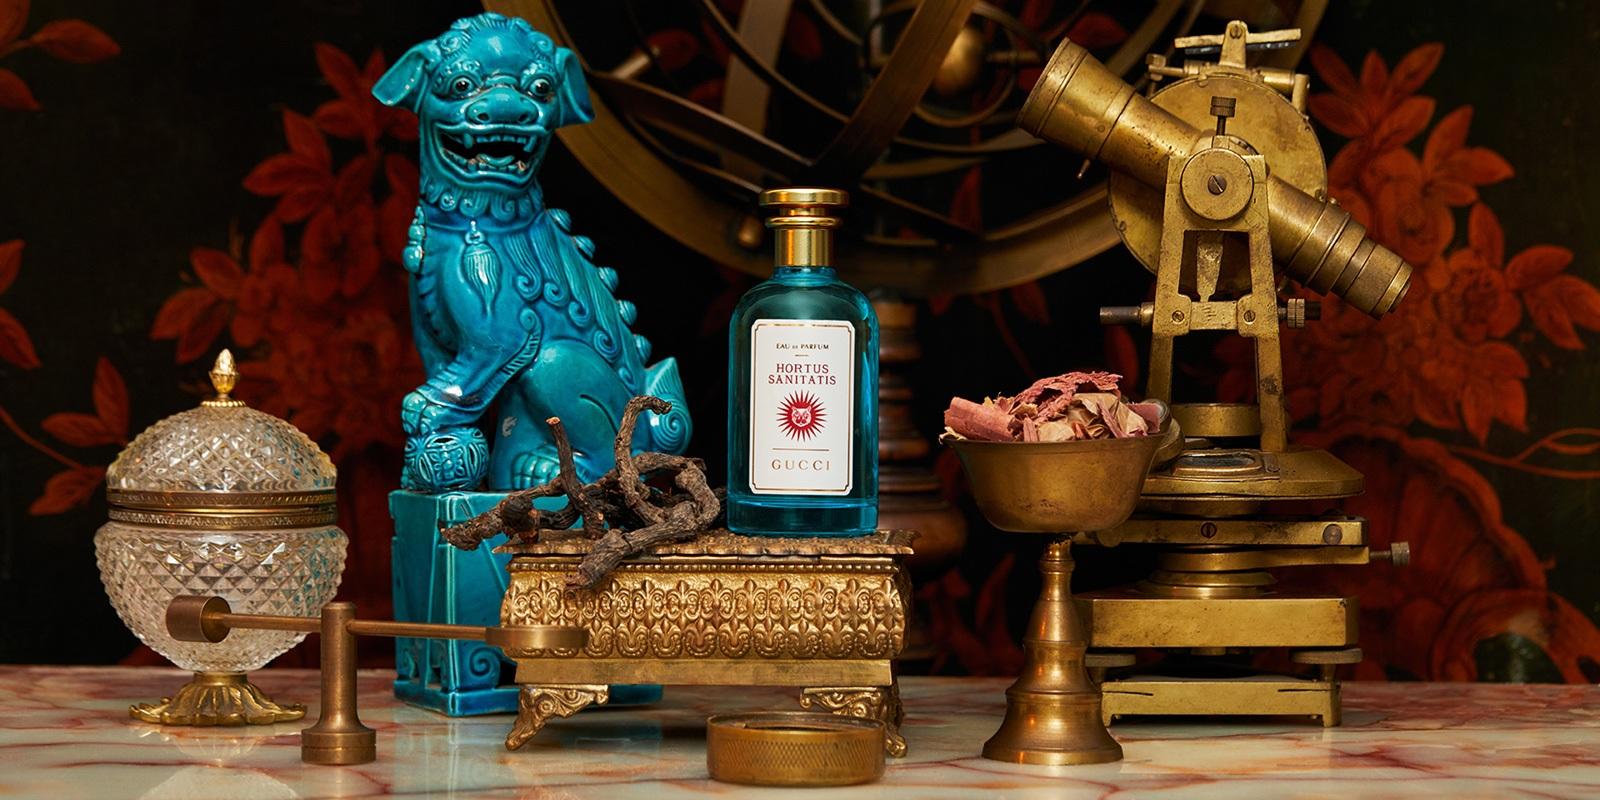 Gucci The Alchemist's Garden Hortus Sanitatis